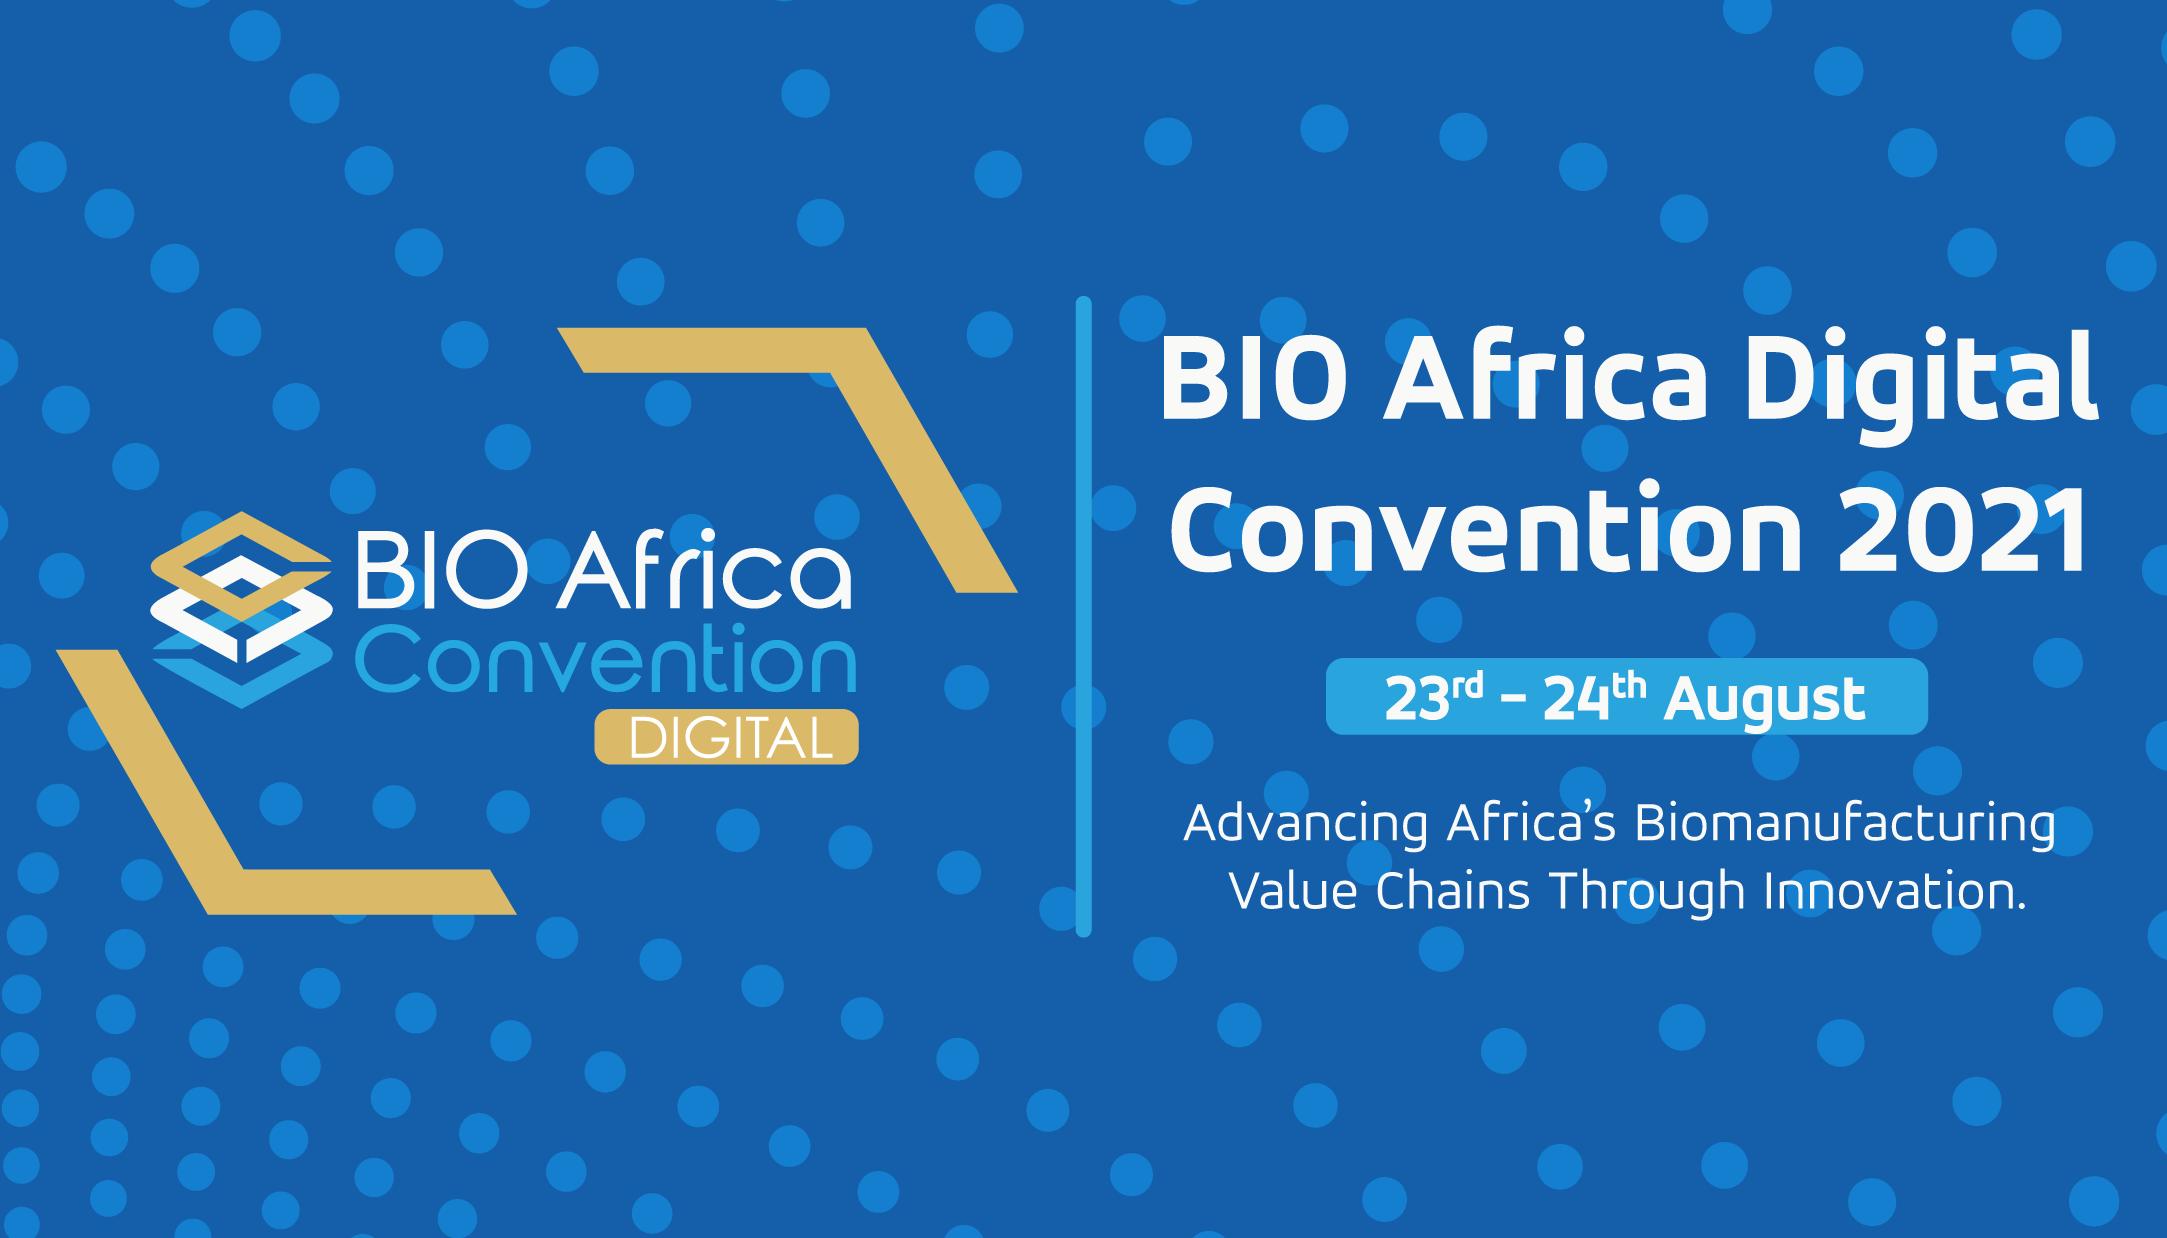 BIO Africa Digital Convention 2021